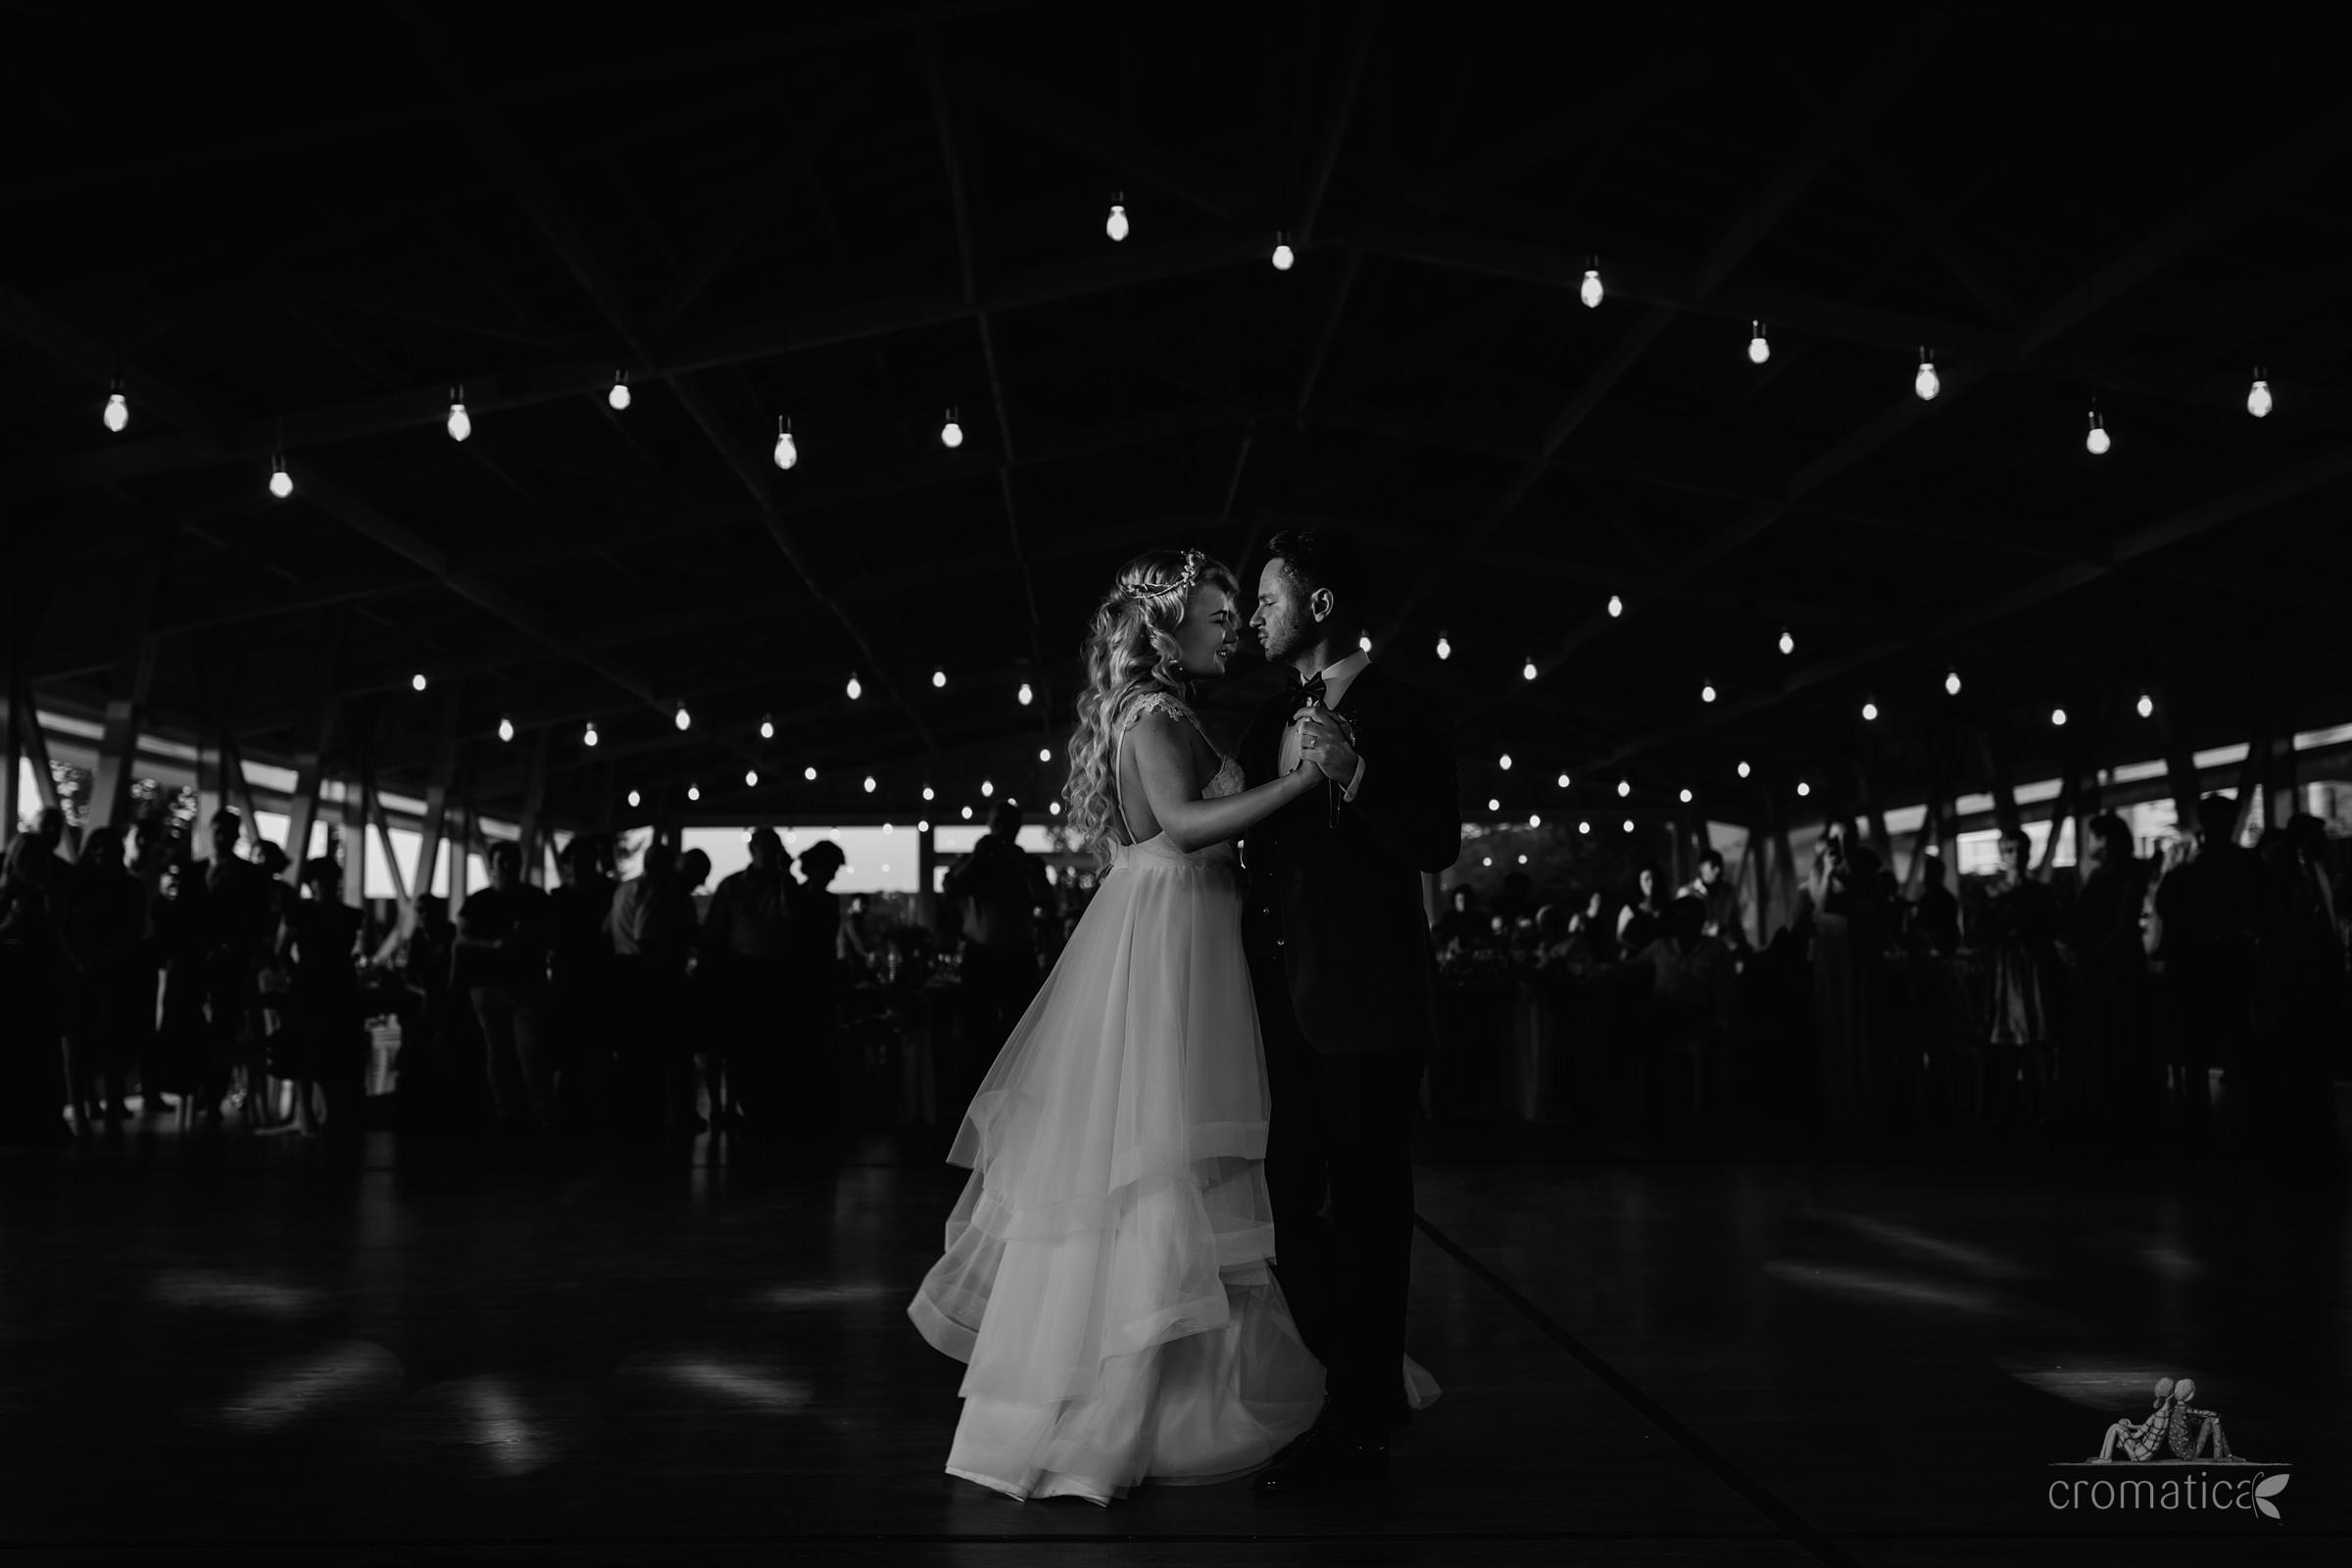 ana mihai fotografii nunta gradina lahovari 118